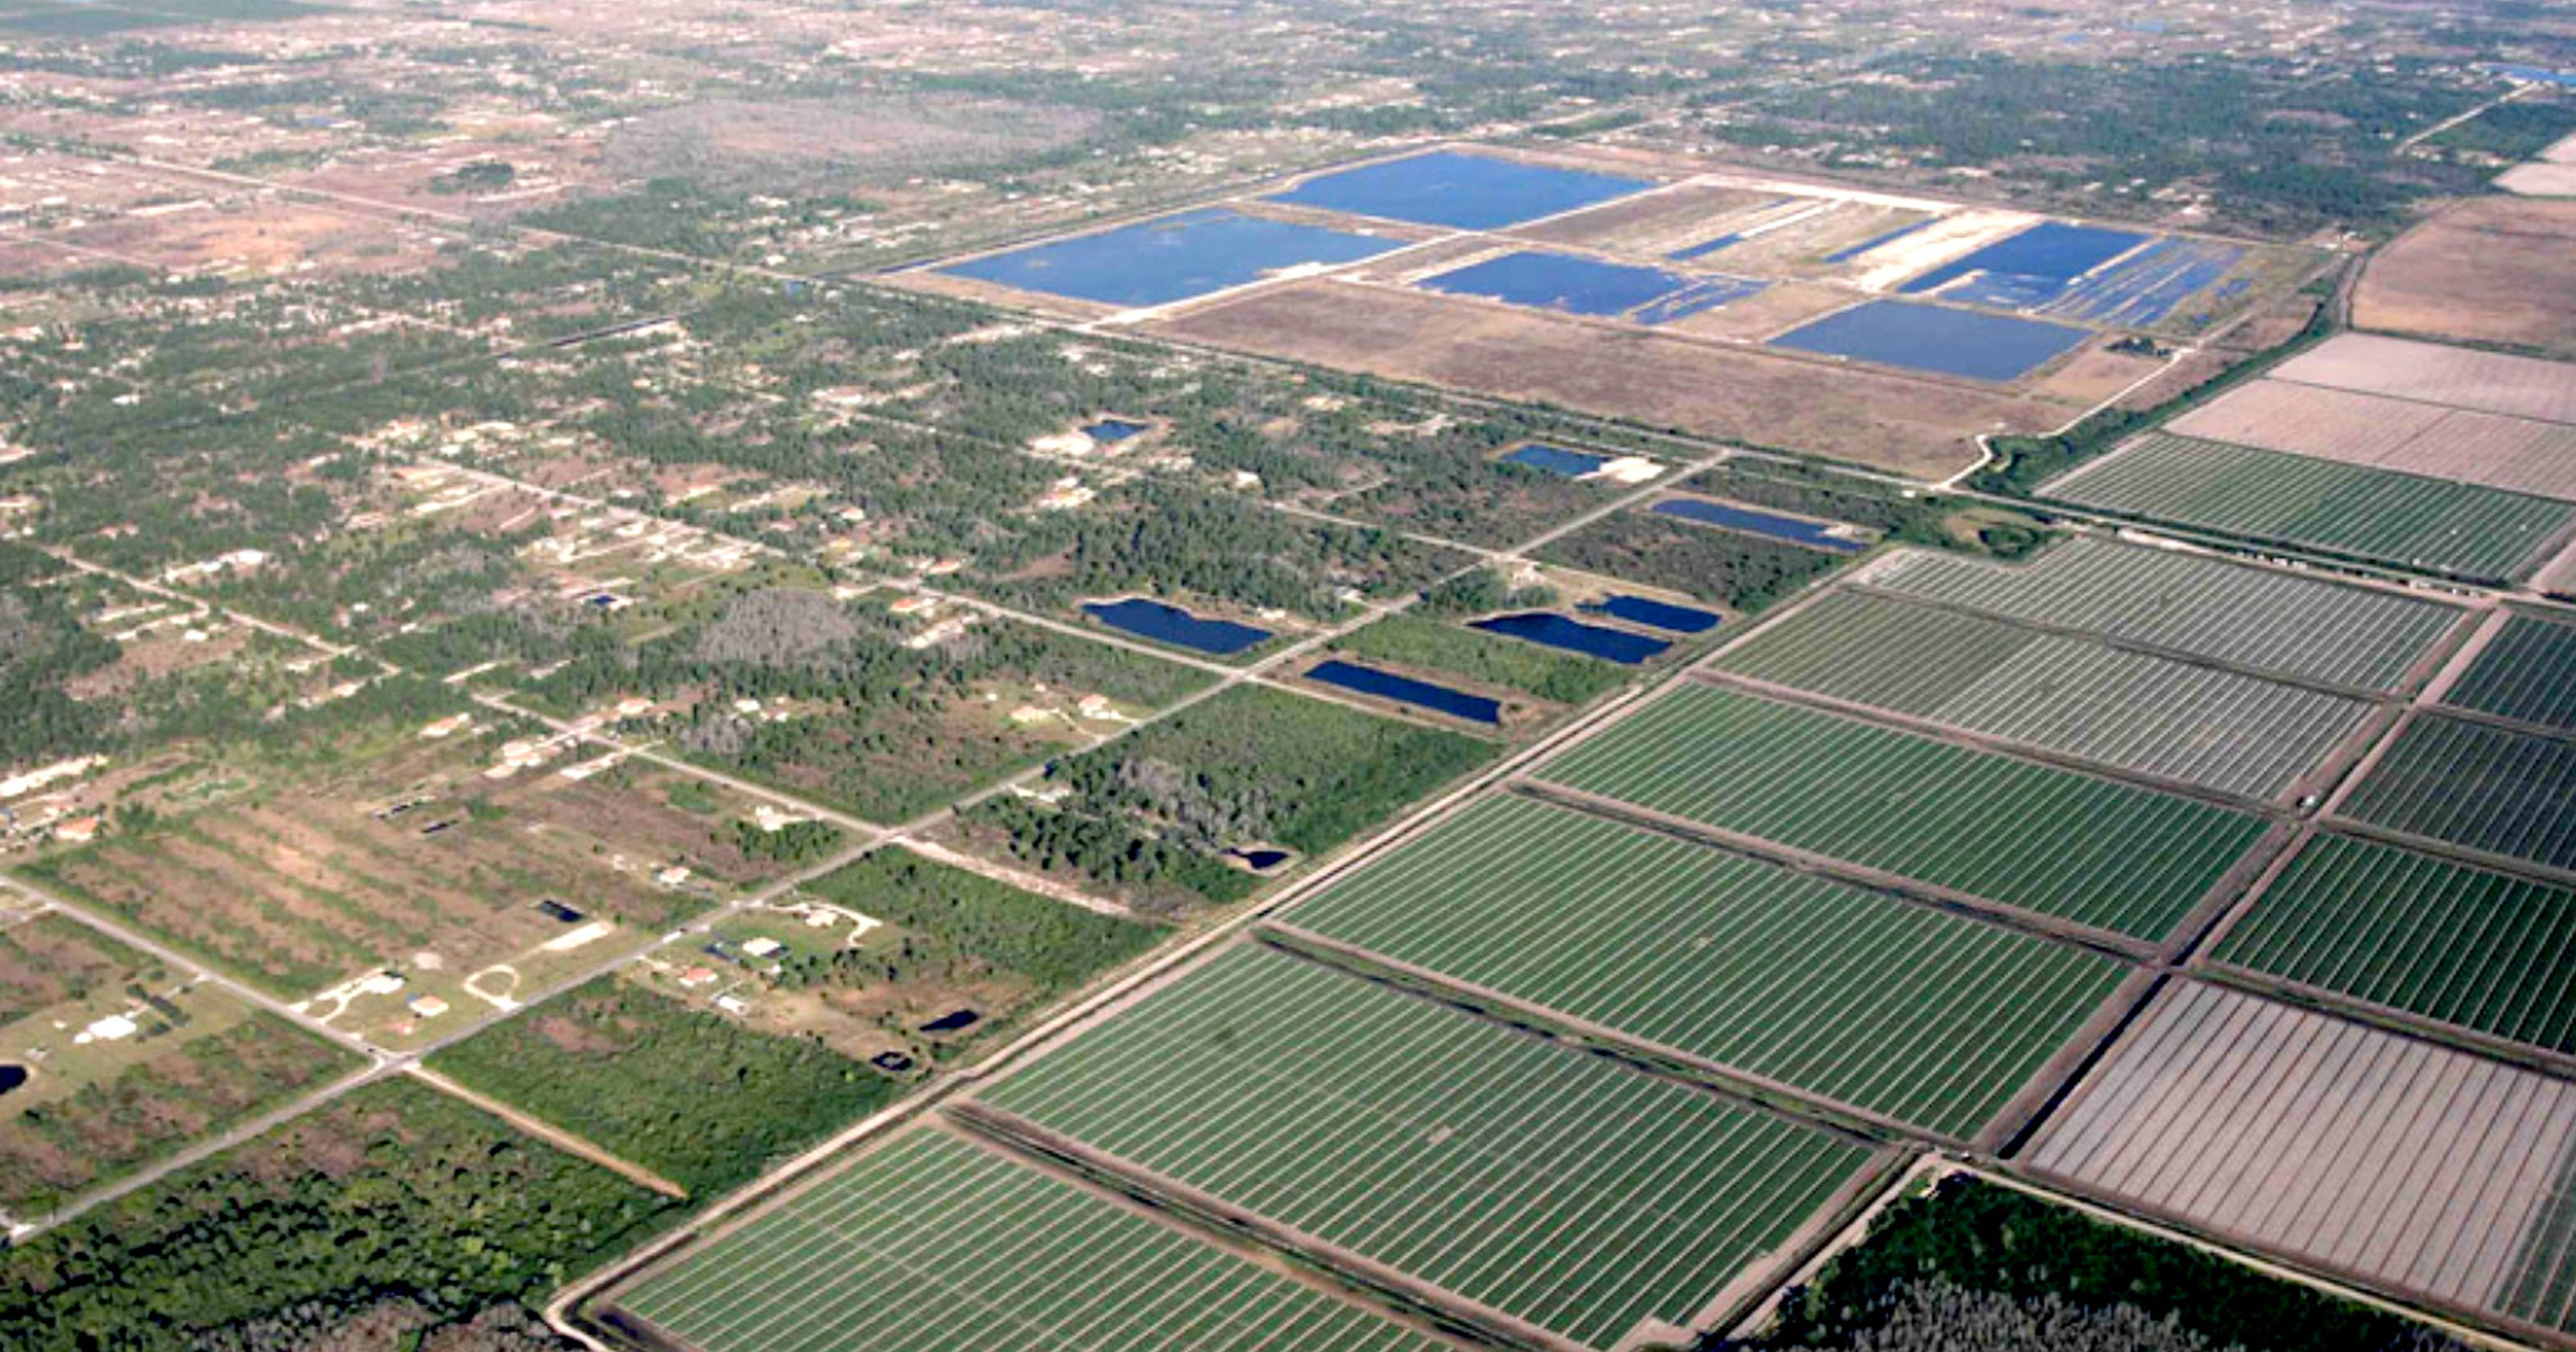 Collier Enterprises plans 1,000-acre development in eastern